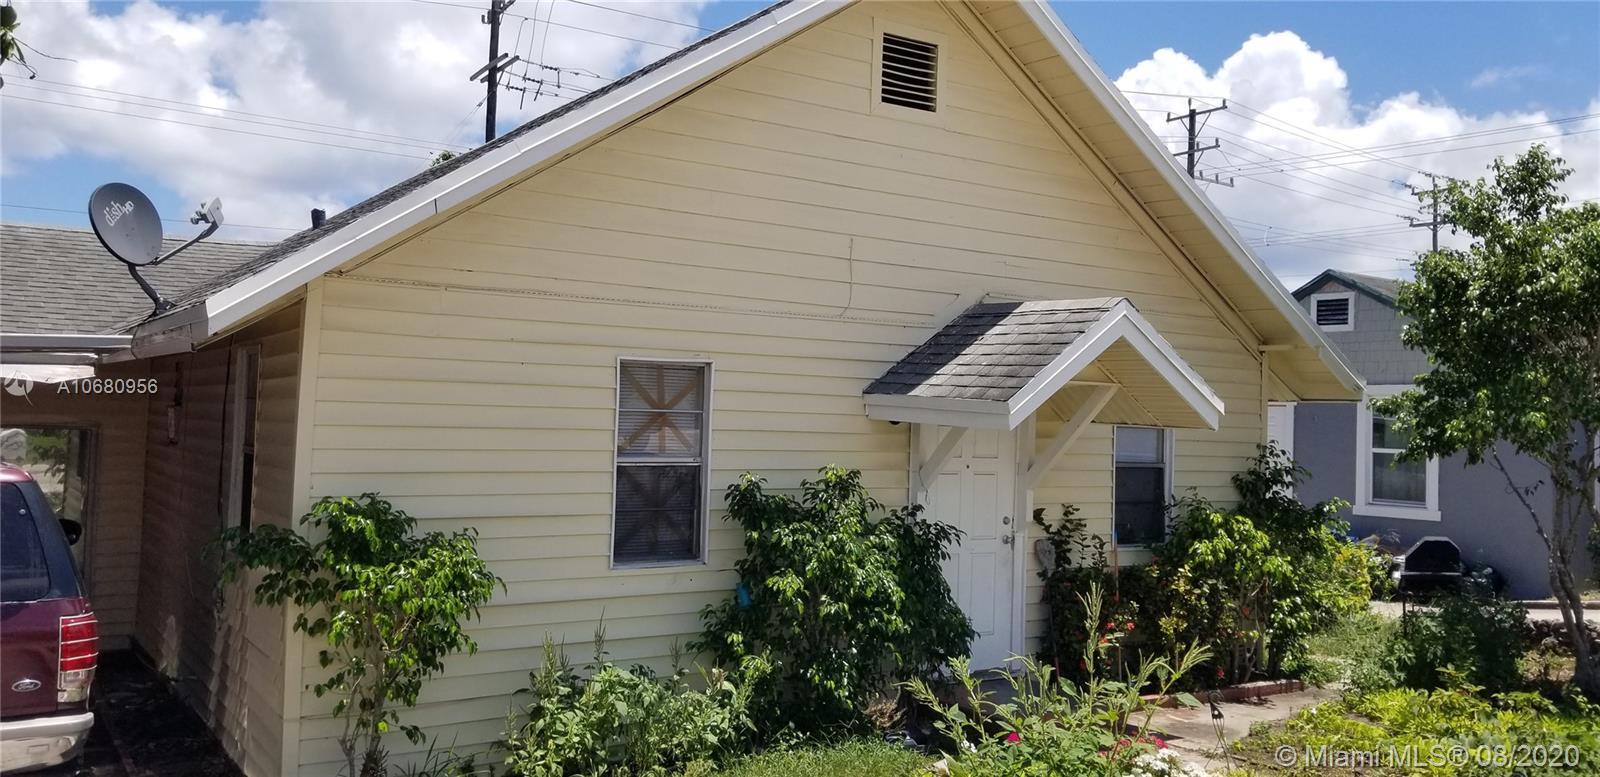 710 N A St, Lake Worth, FL 33460